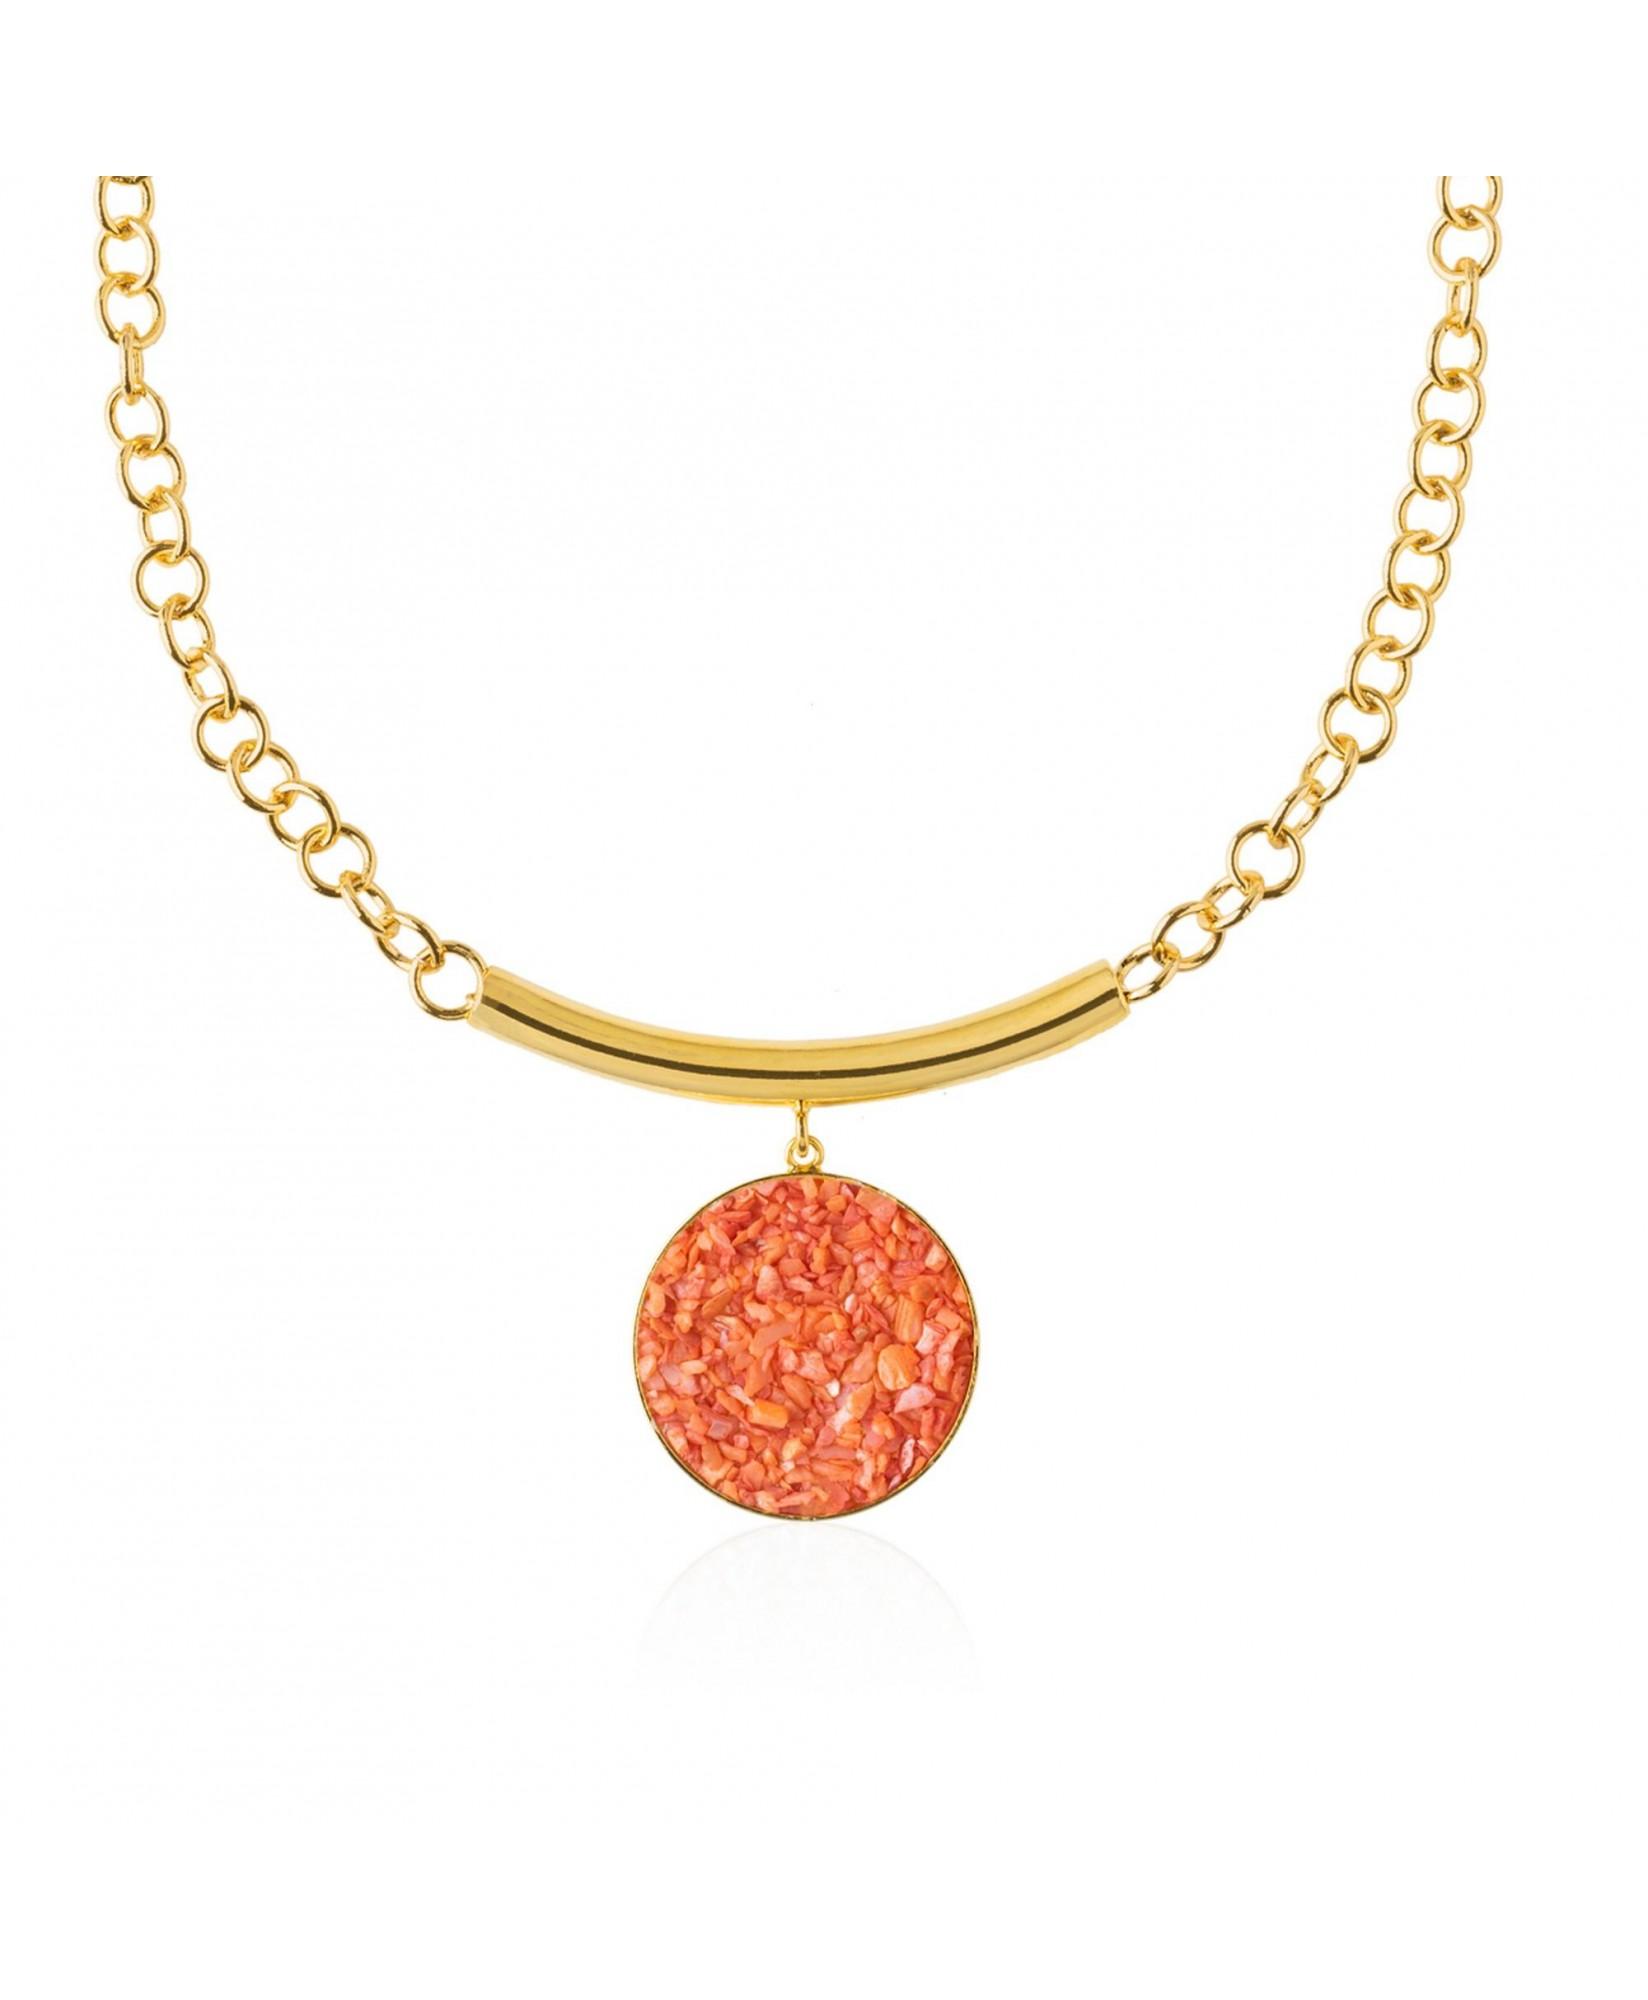 Collar oro con colgante nácar coral Isis Collar oro con colgante nácar coral Isis